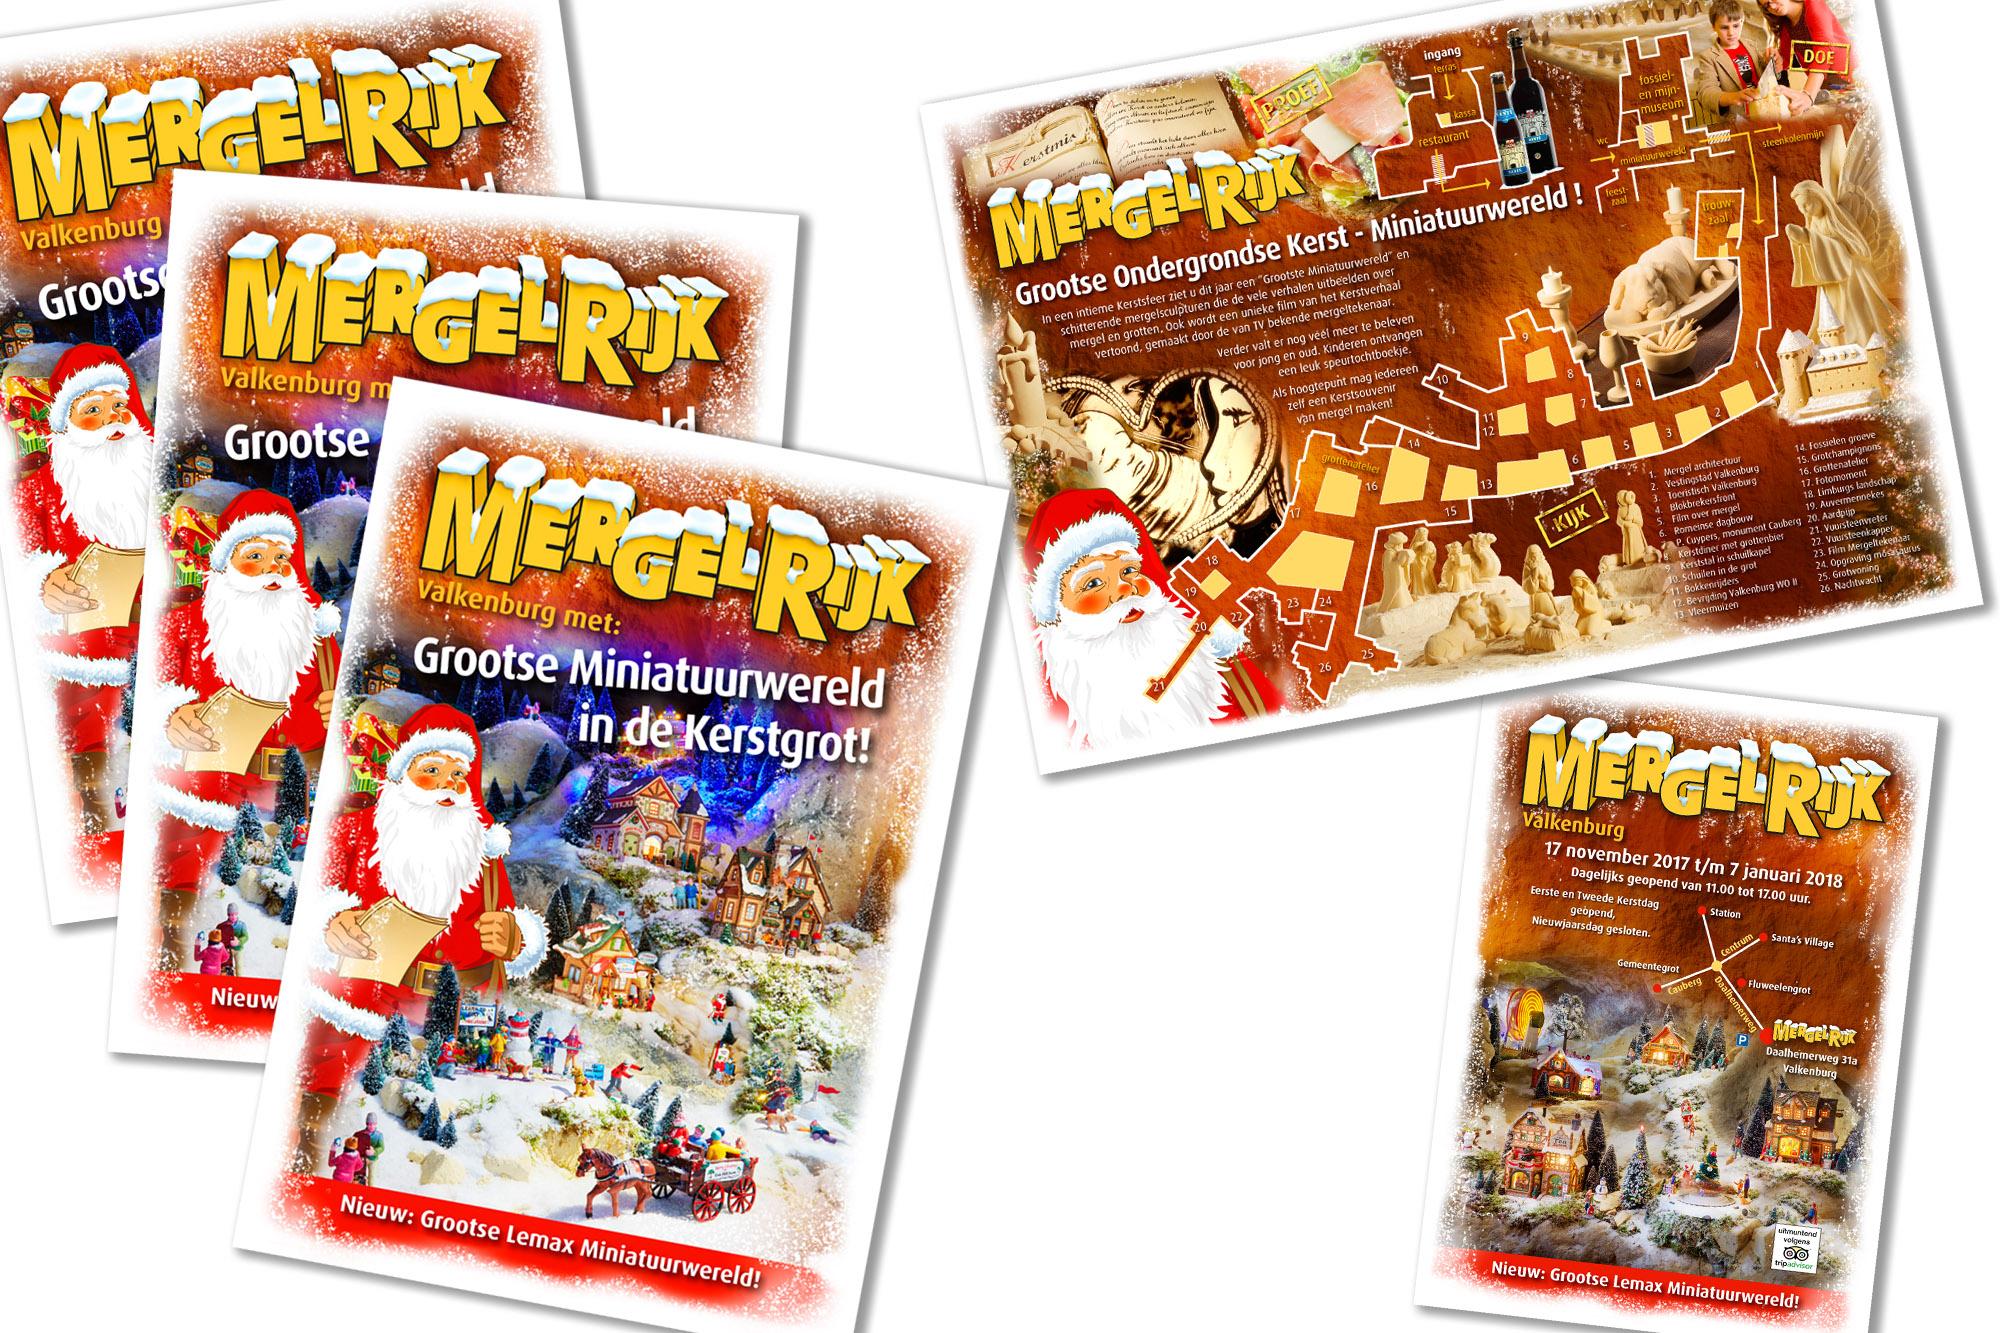 SPUISERS folder mergelrijk Valkenburg kerst kerststad